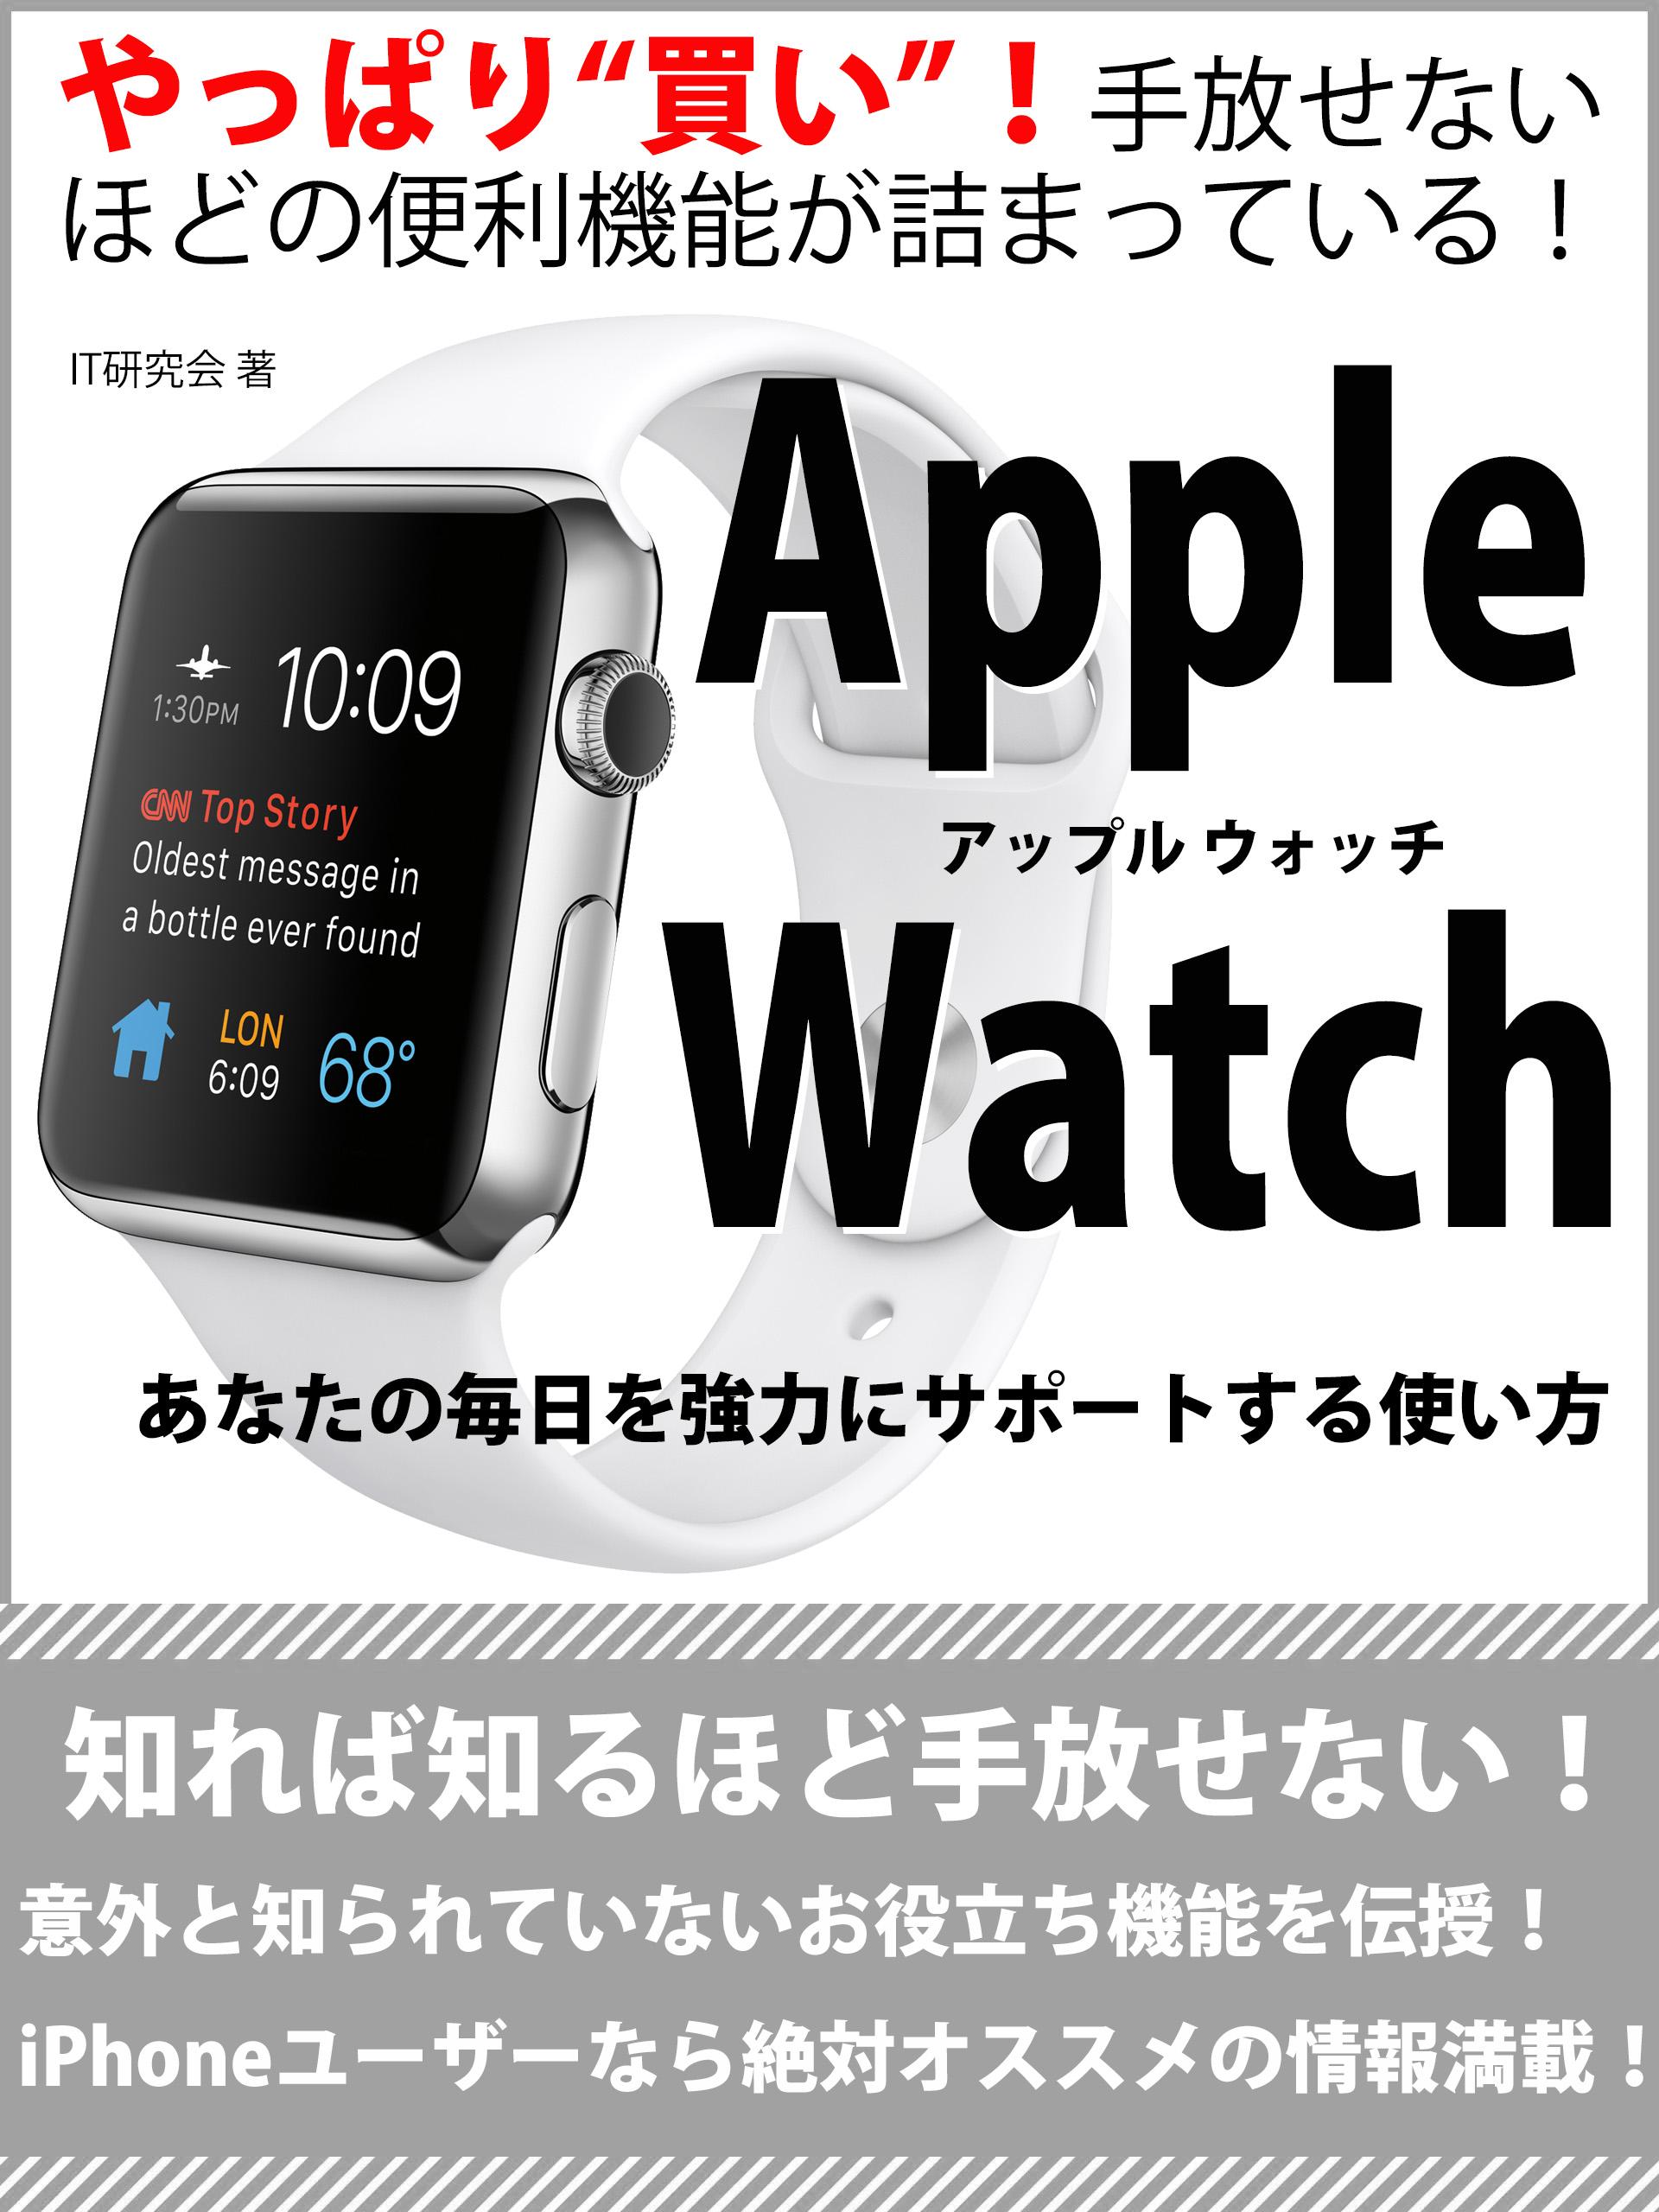 Apple Watch あなたの毎日を強力にサポートする使い方